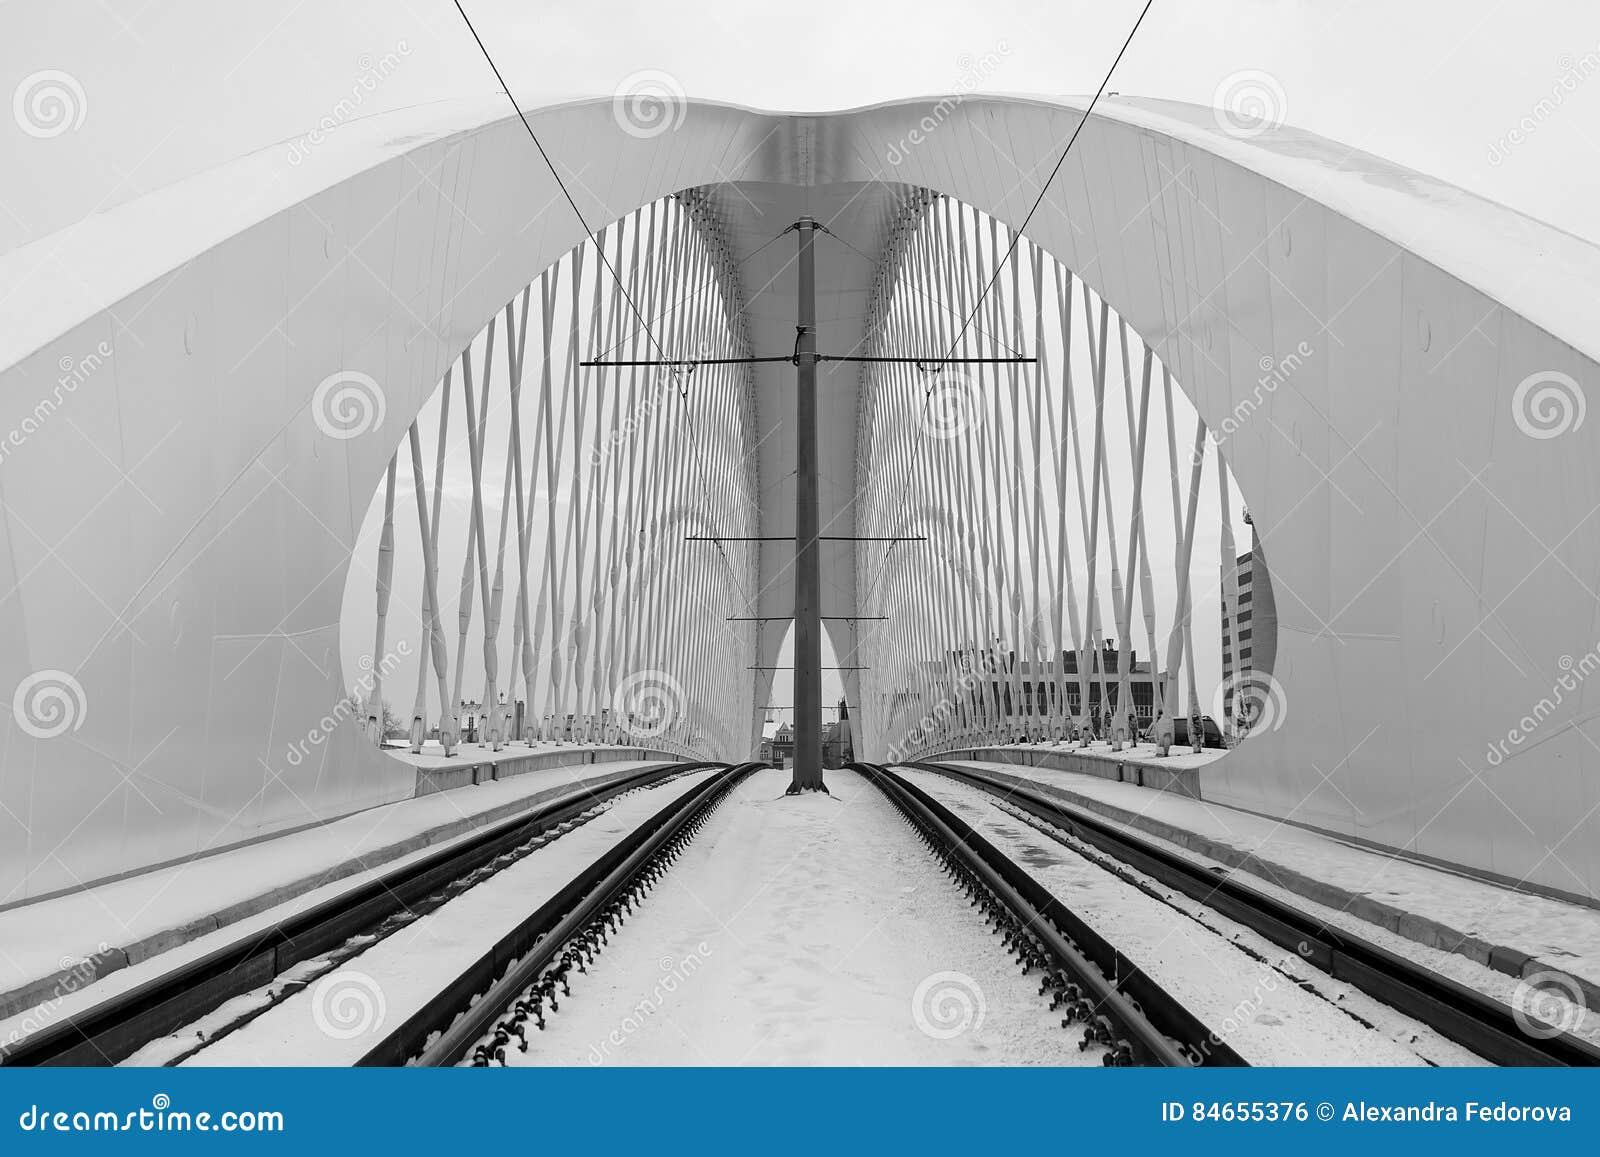 Modern Architecture Detail troja bridge, prague city. modern architecture detail. abstract